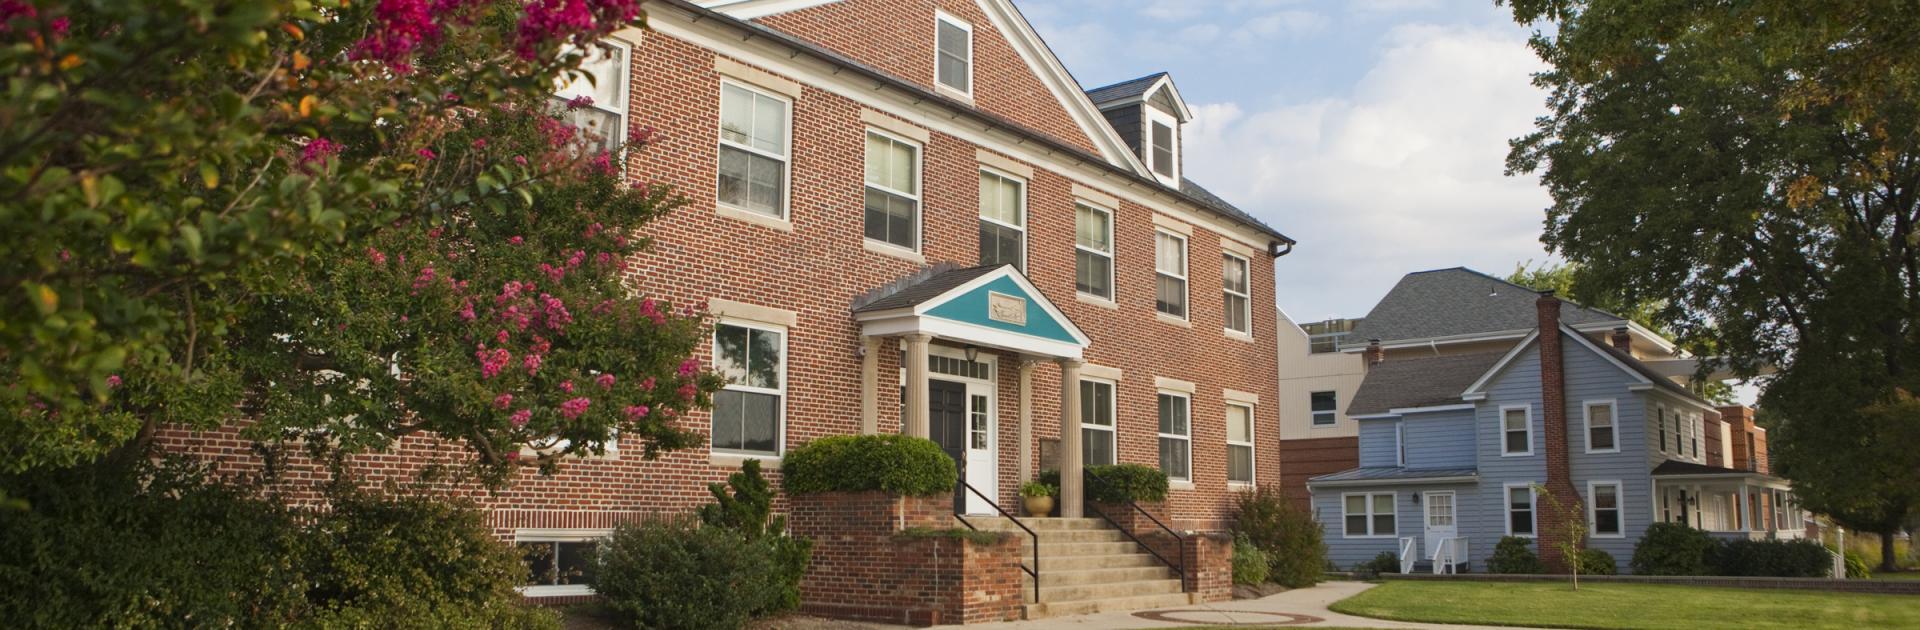 Chesapeake Biological Laboratory building